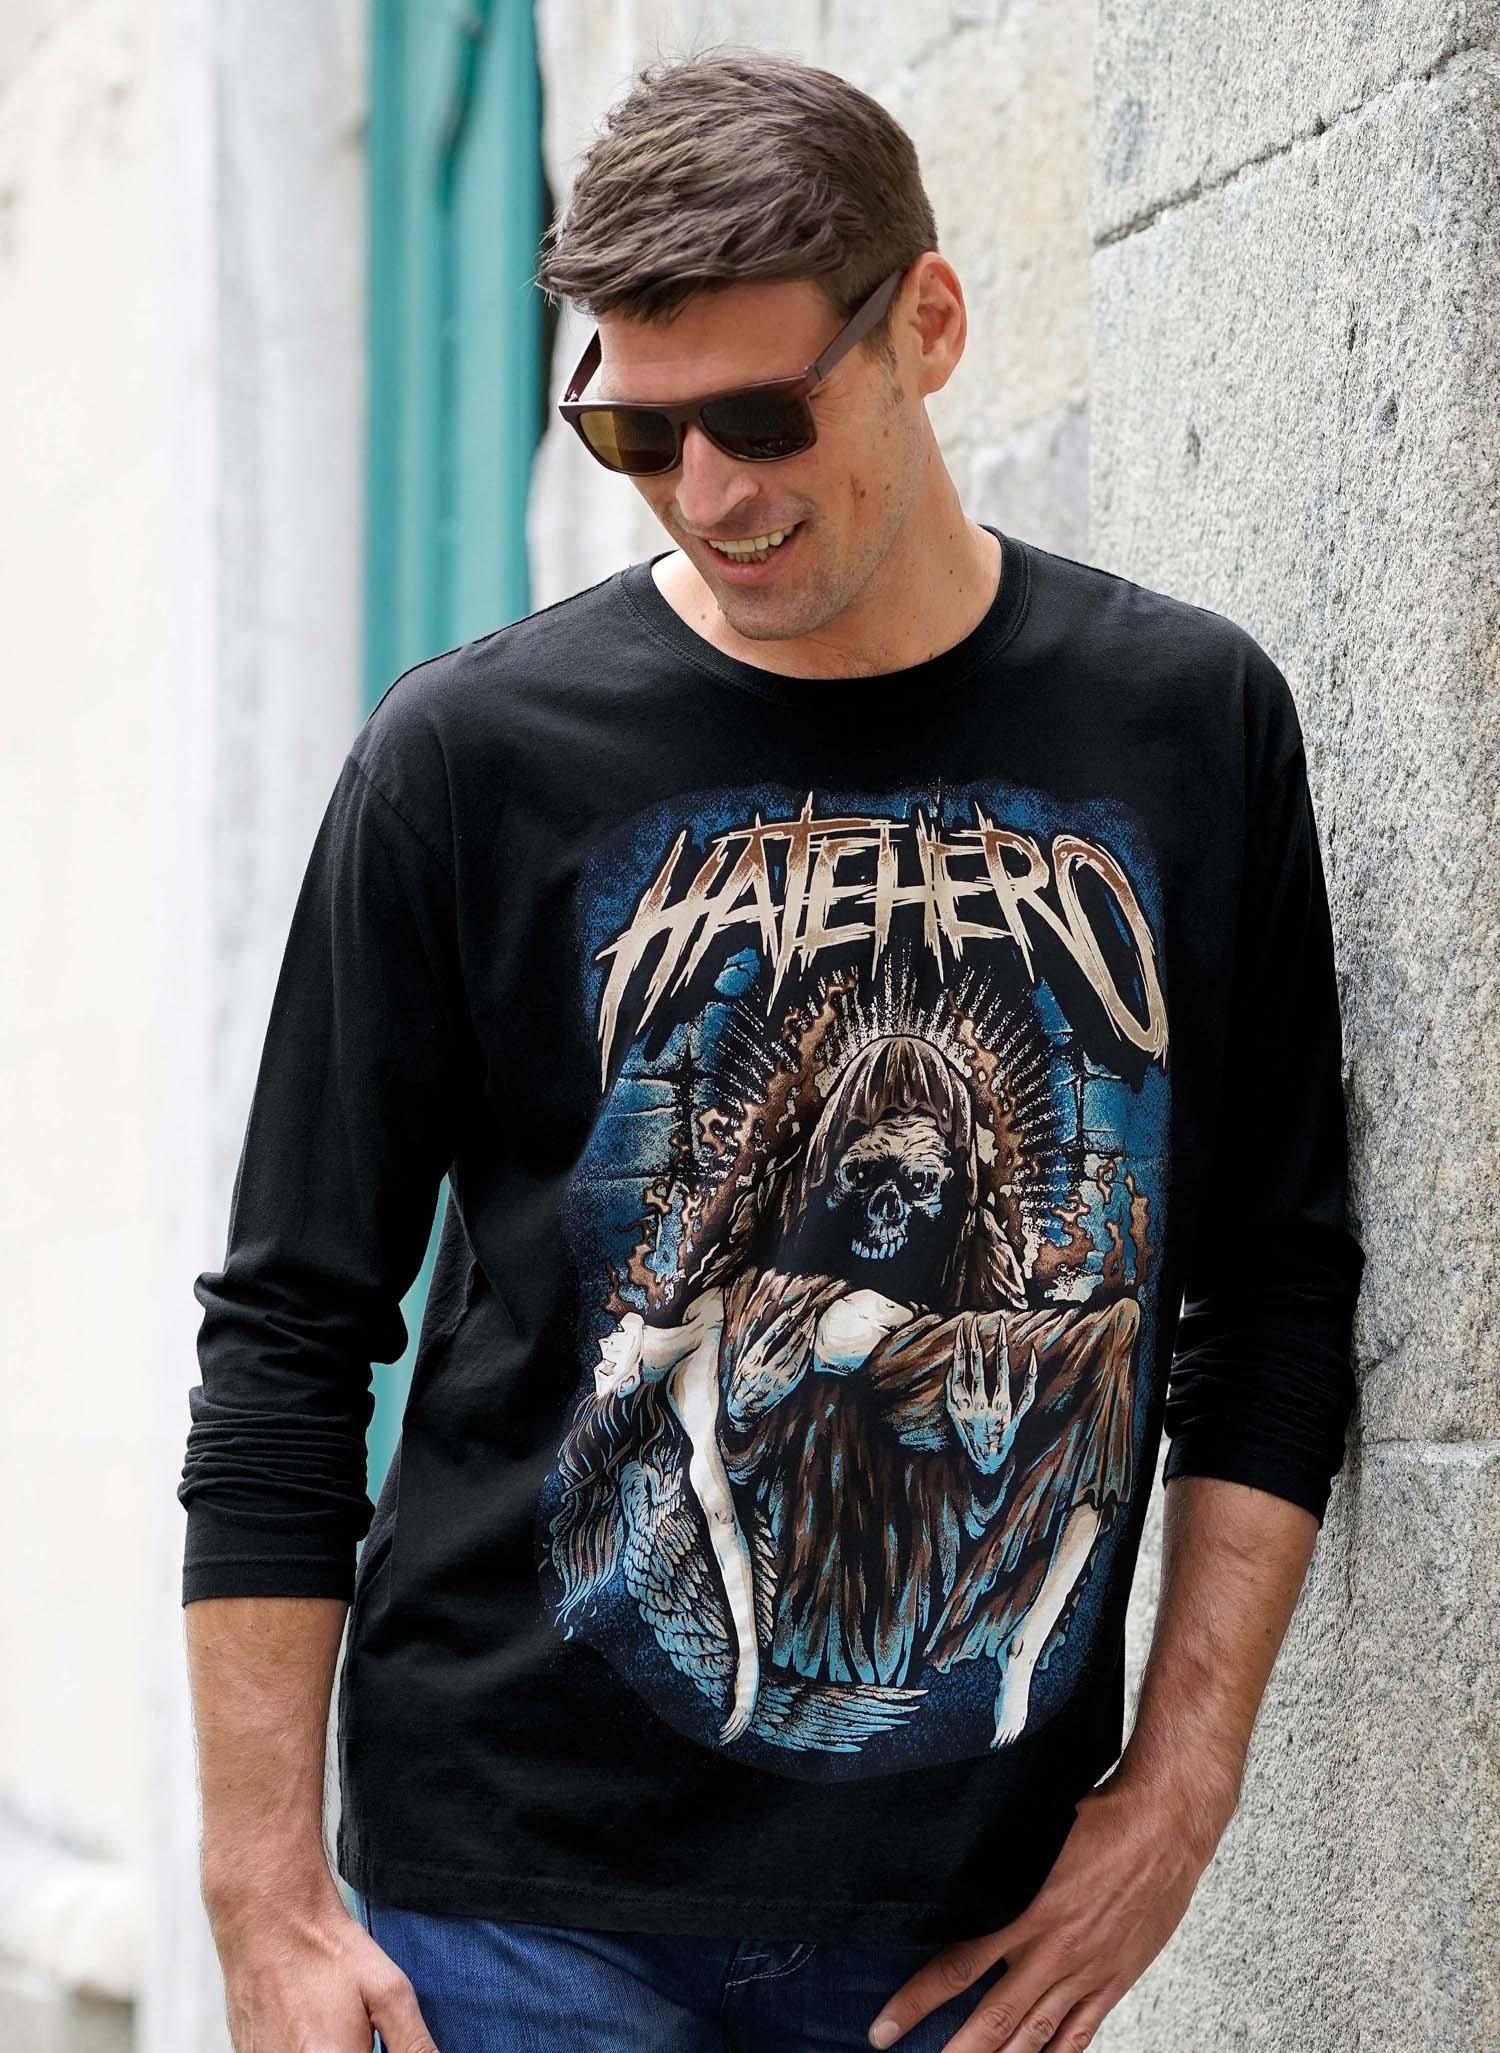 "H-LA-Shirt""HATEHERO"" schwarz L 010 - 1 - Ronja.ch"